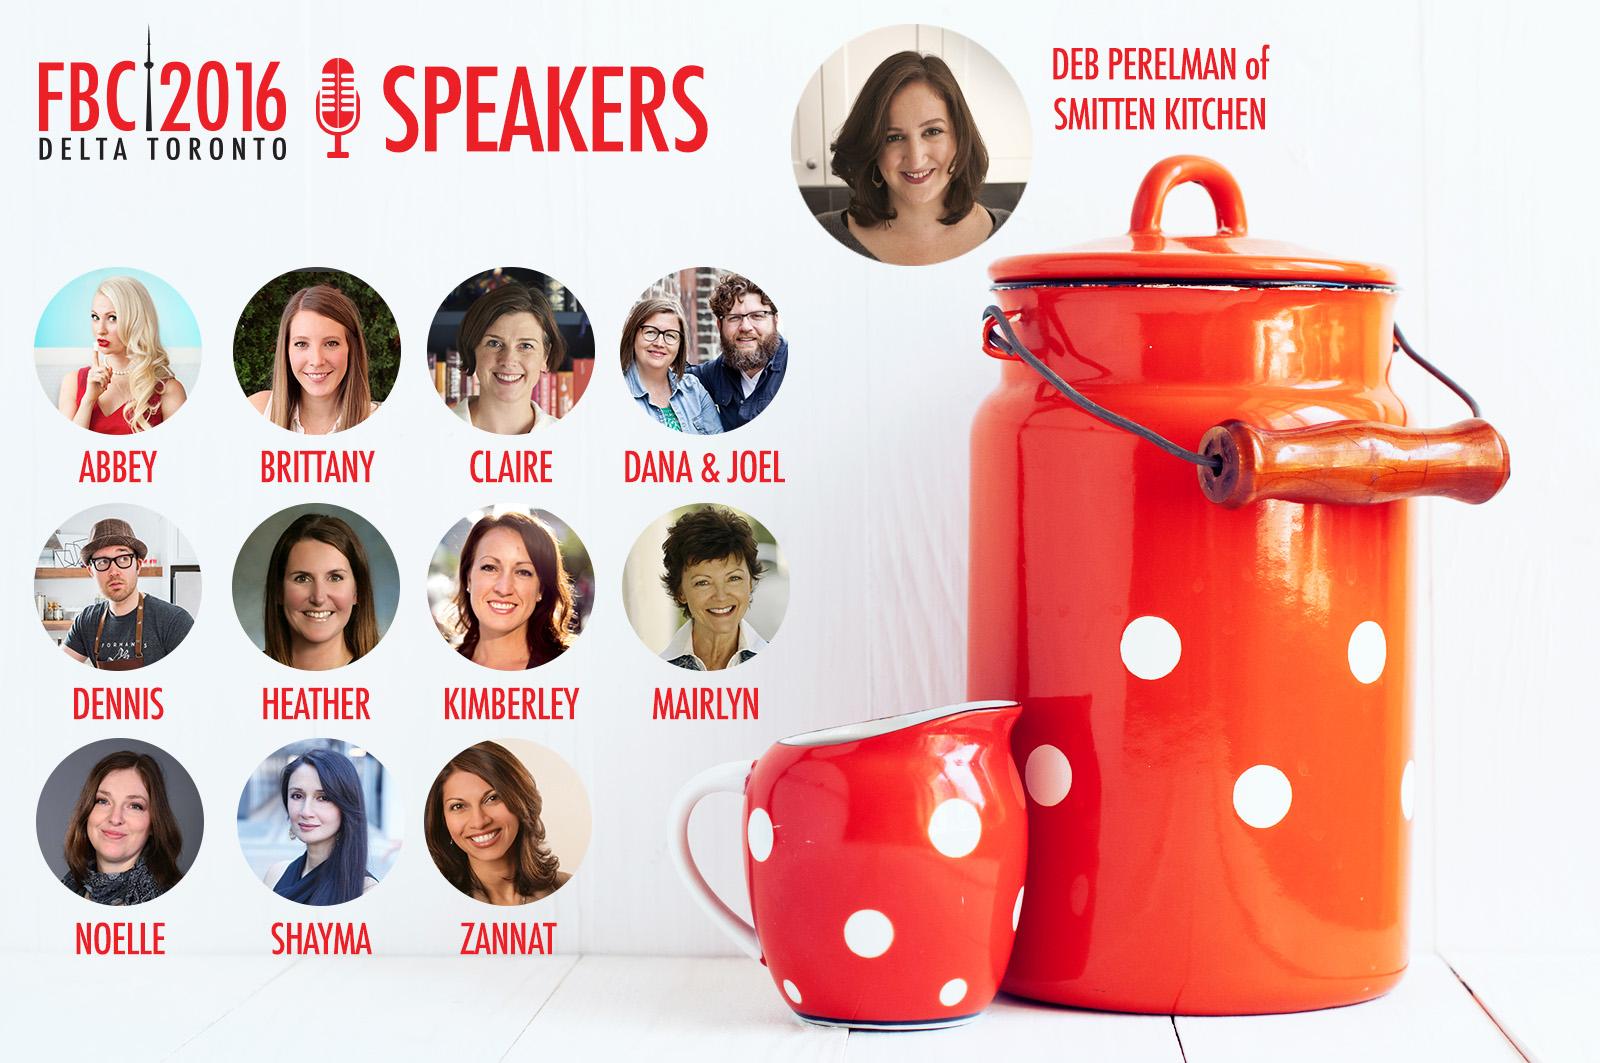 FBC2016 Speaker Lineup